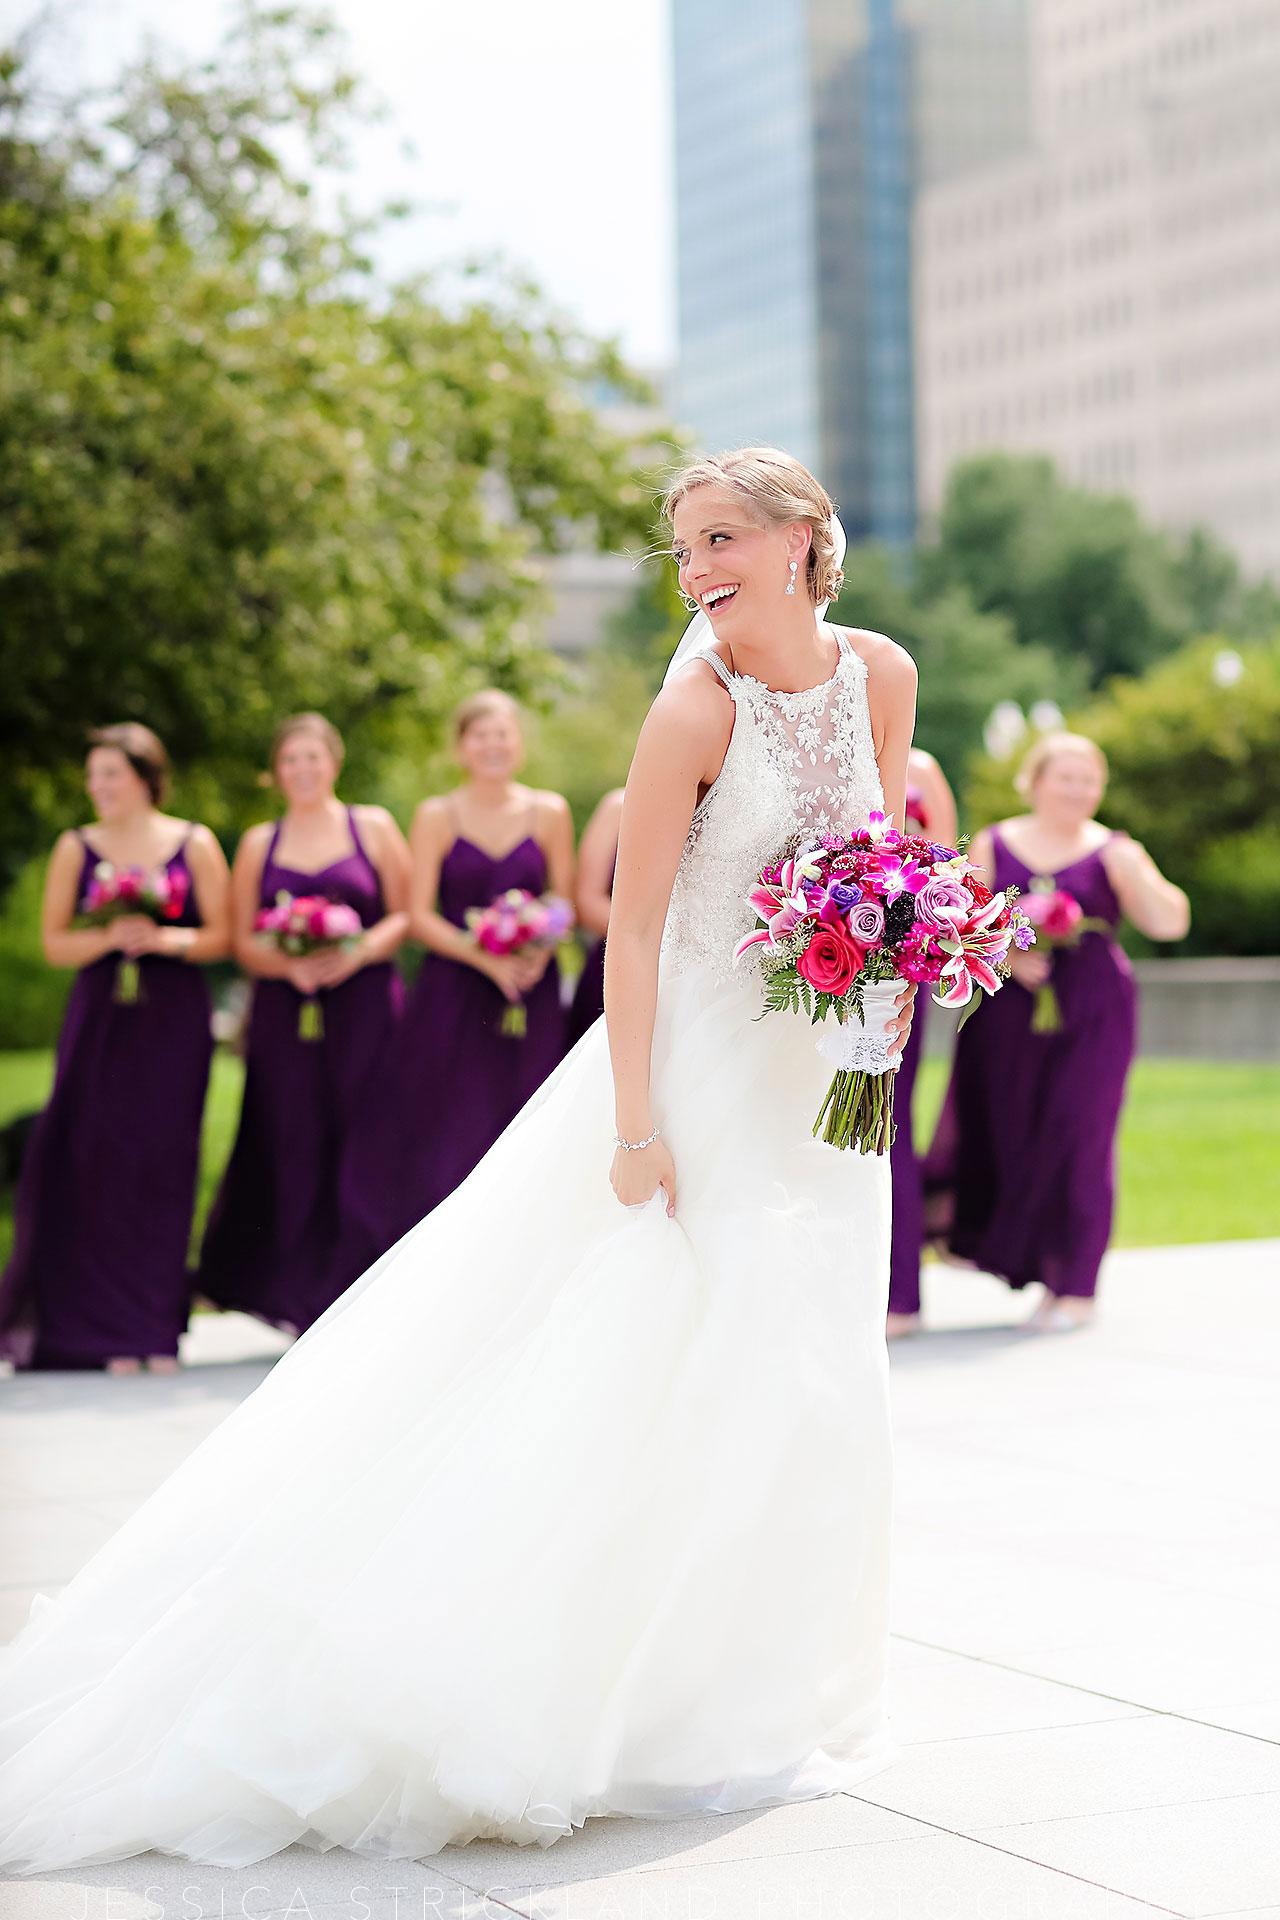 Serra Alex Regions Tower Indianapolis Wedding 099 watermarked